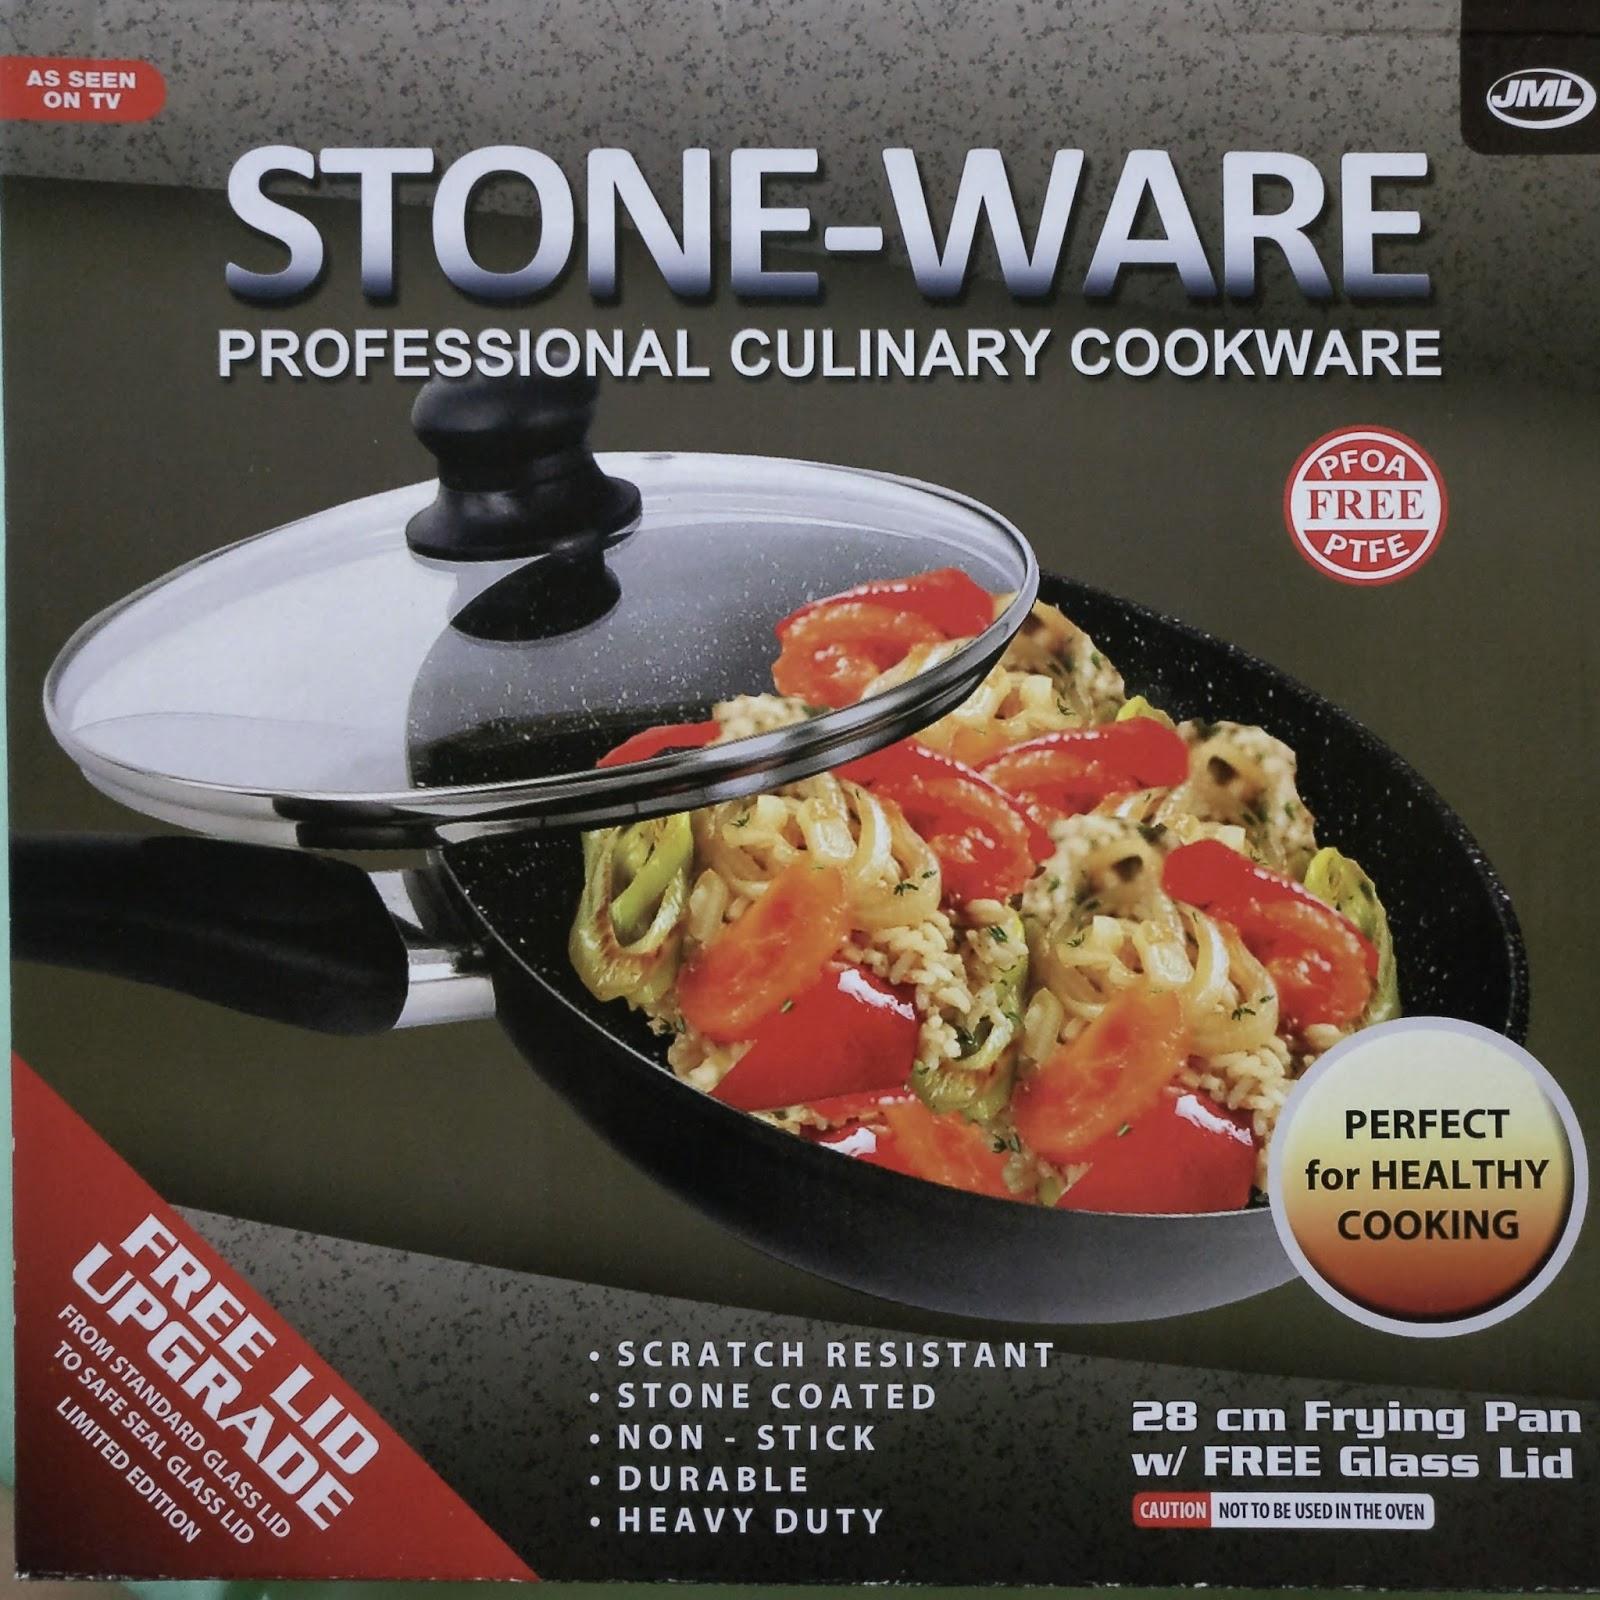 Ramblings Of A Pinoy Consumer Jml Stone Ware 28 Cm Frying